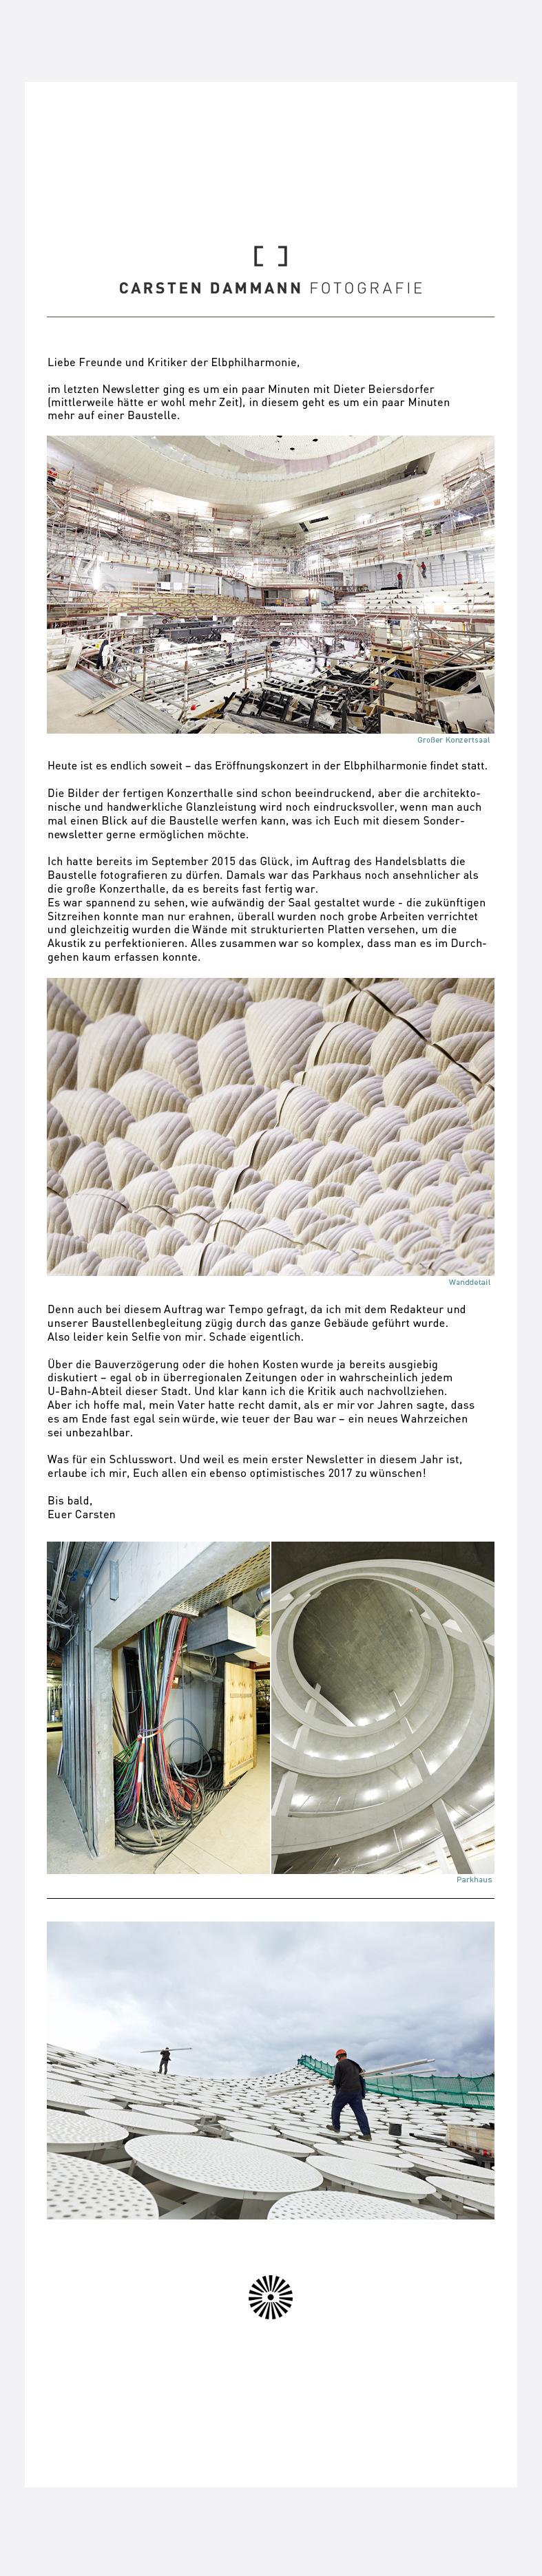 Carsten Dammann News 2 elphi.jpg